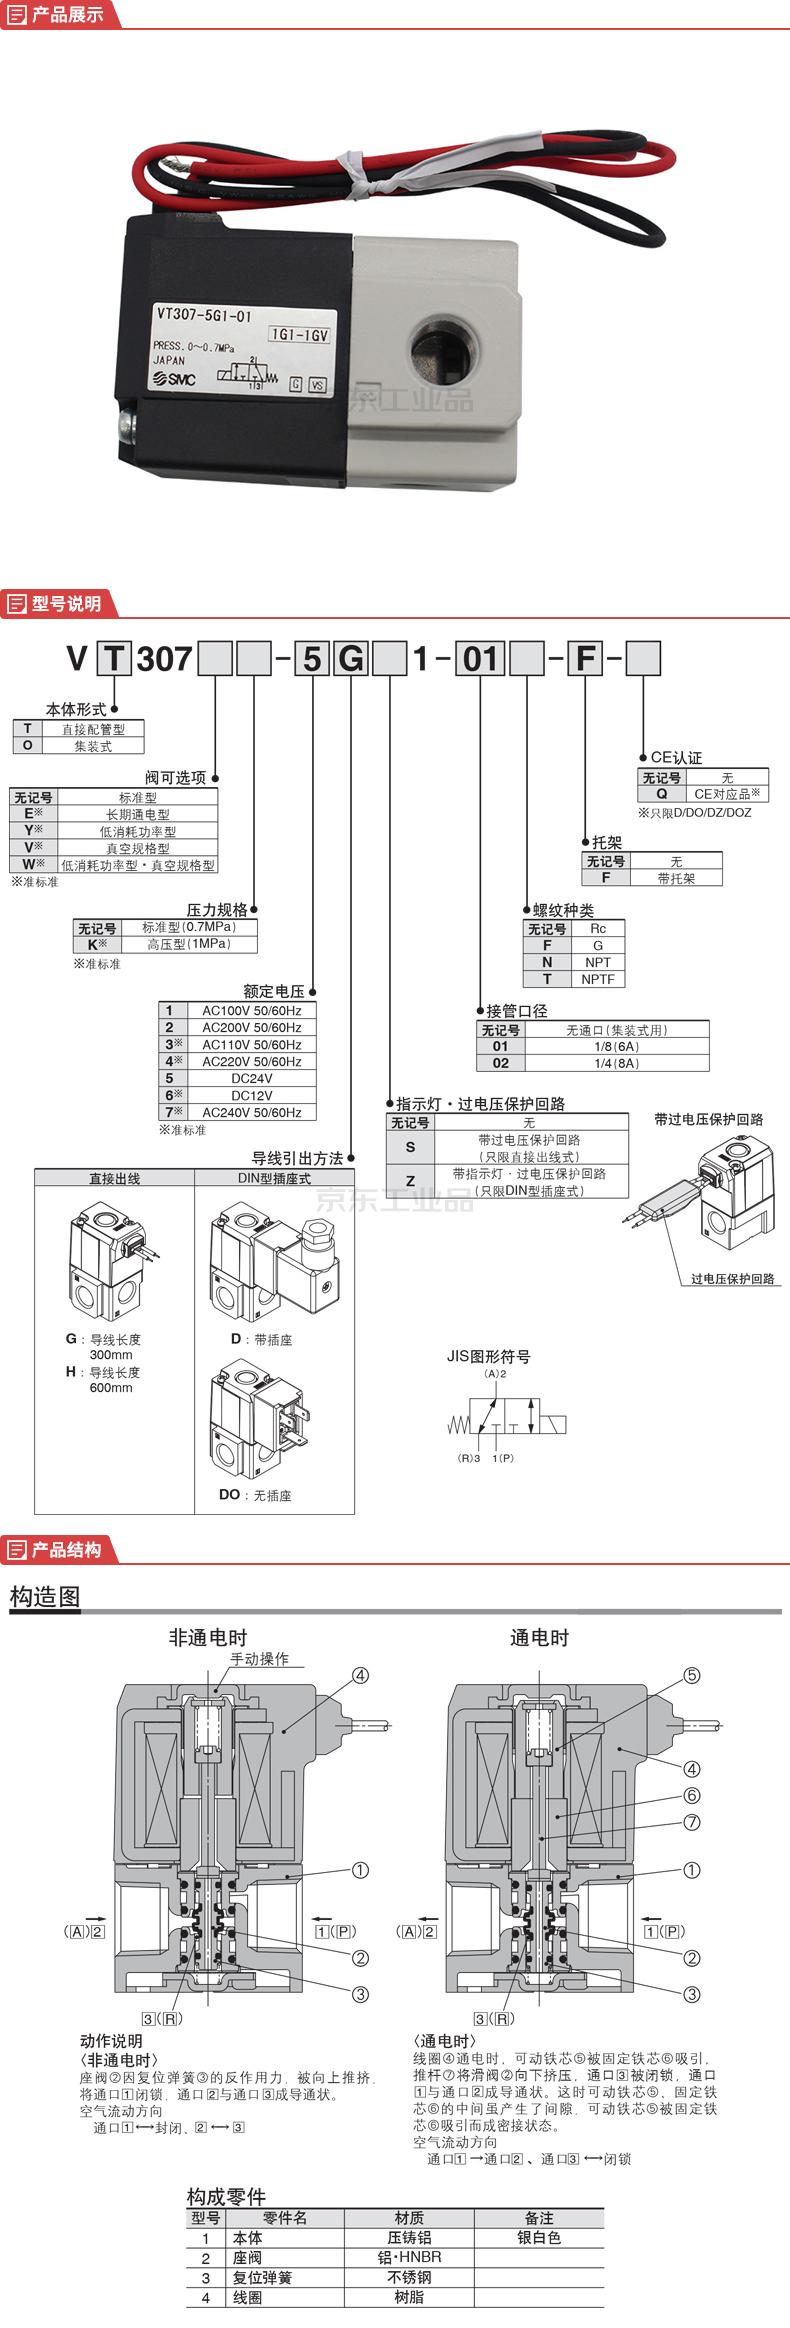 SMC 3通电磁阀/直动式座阀;VT307-5G1-01